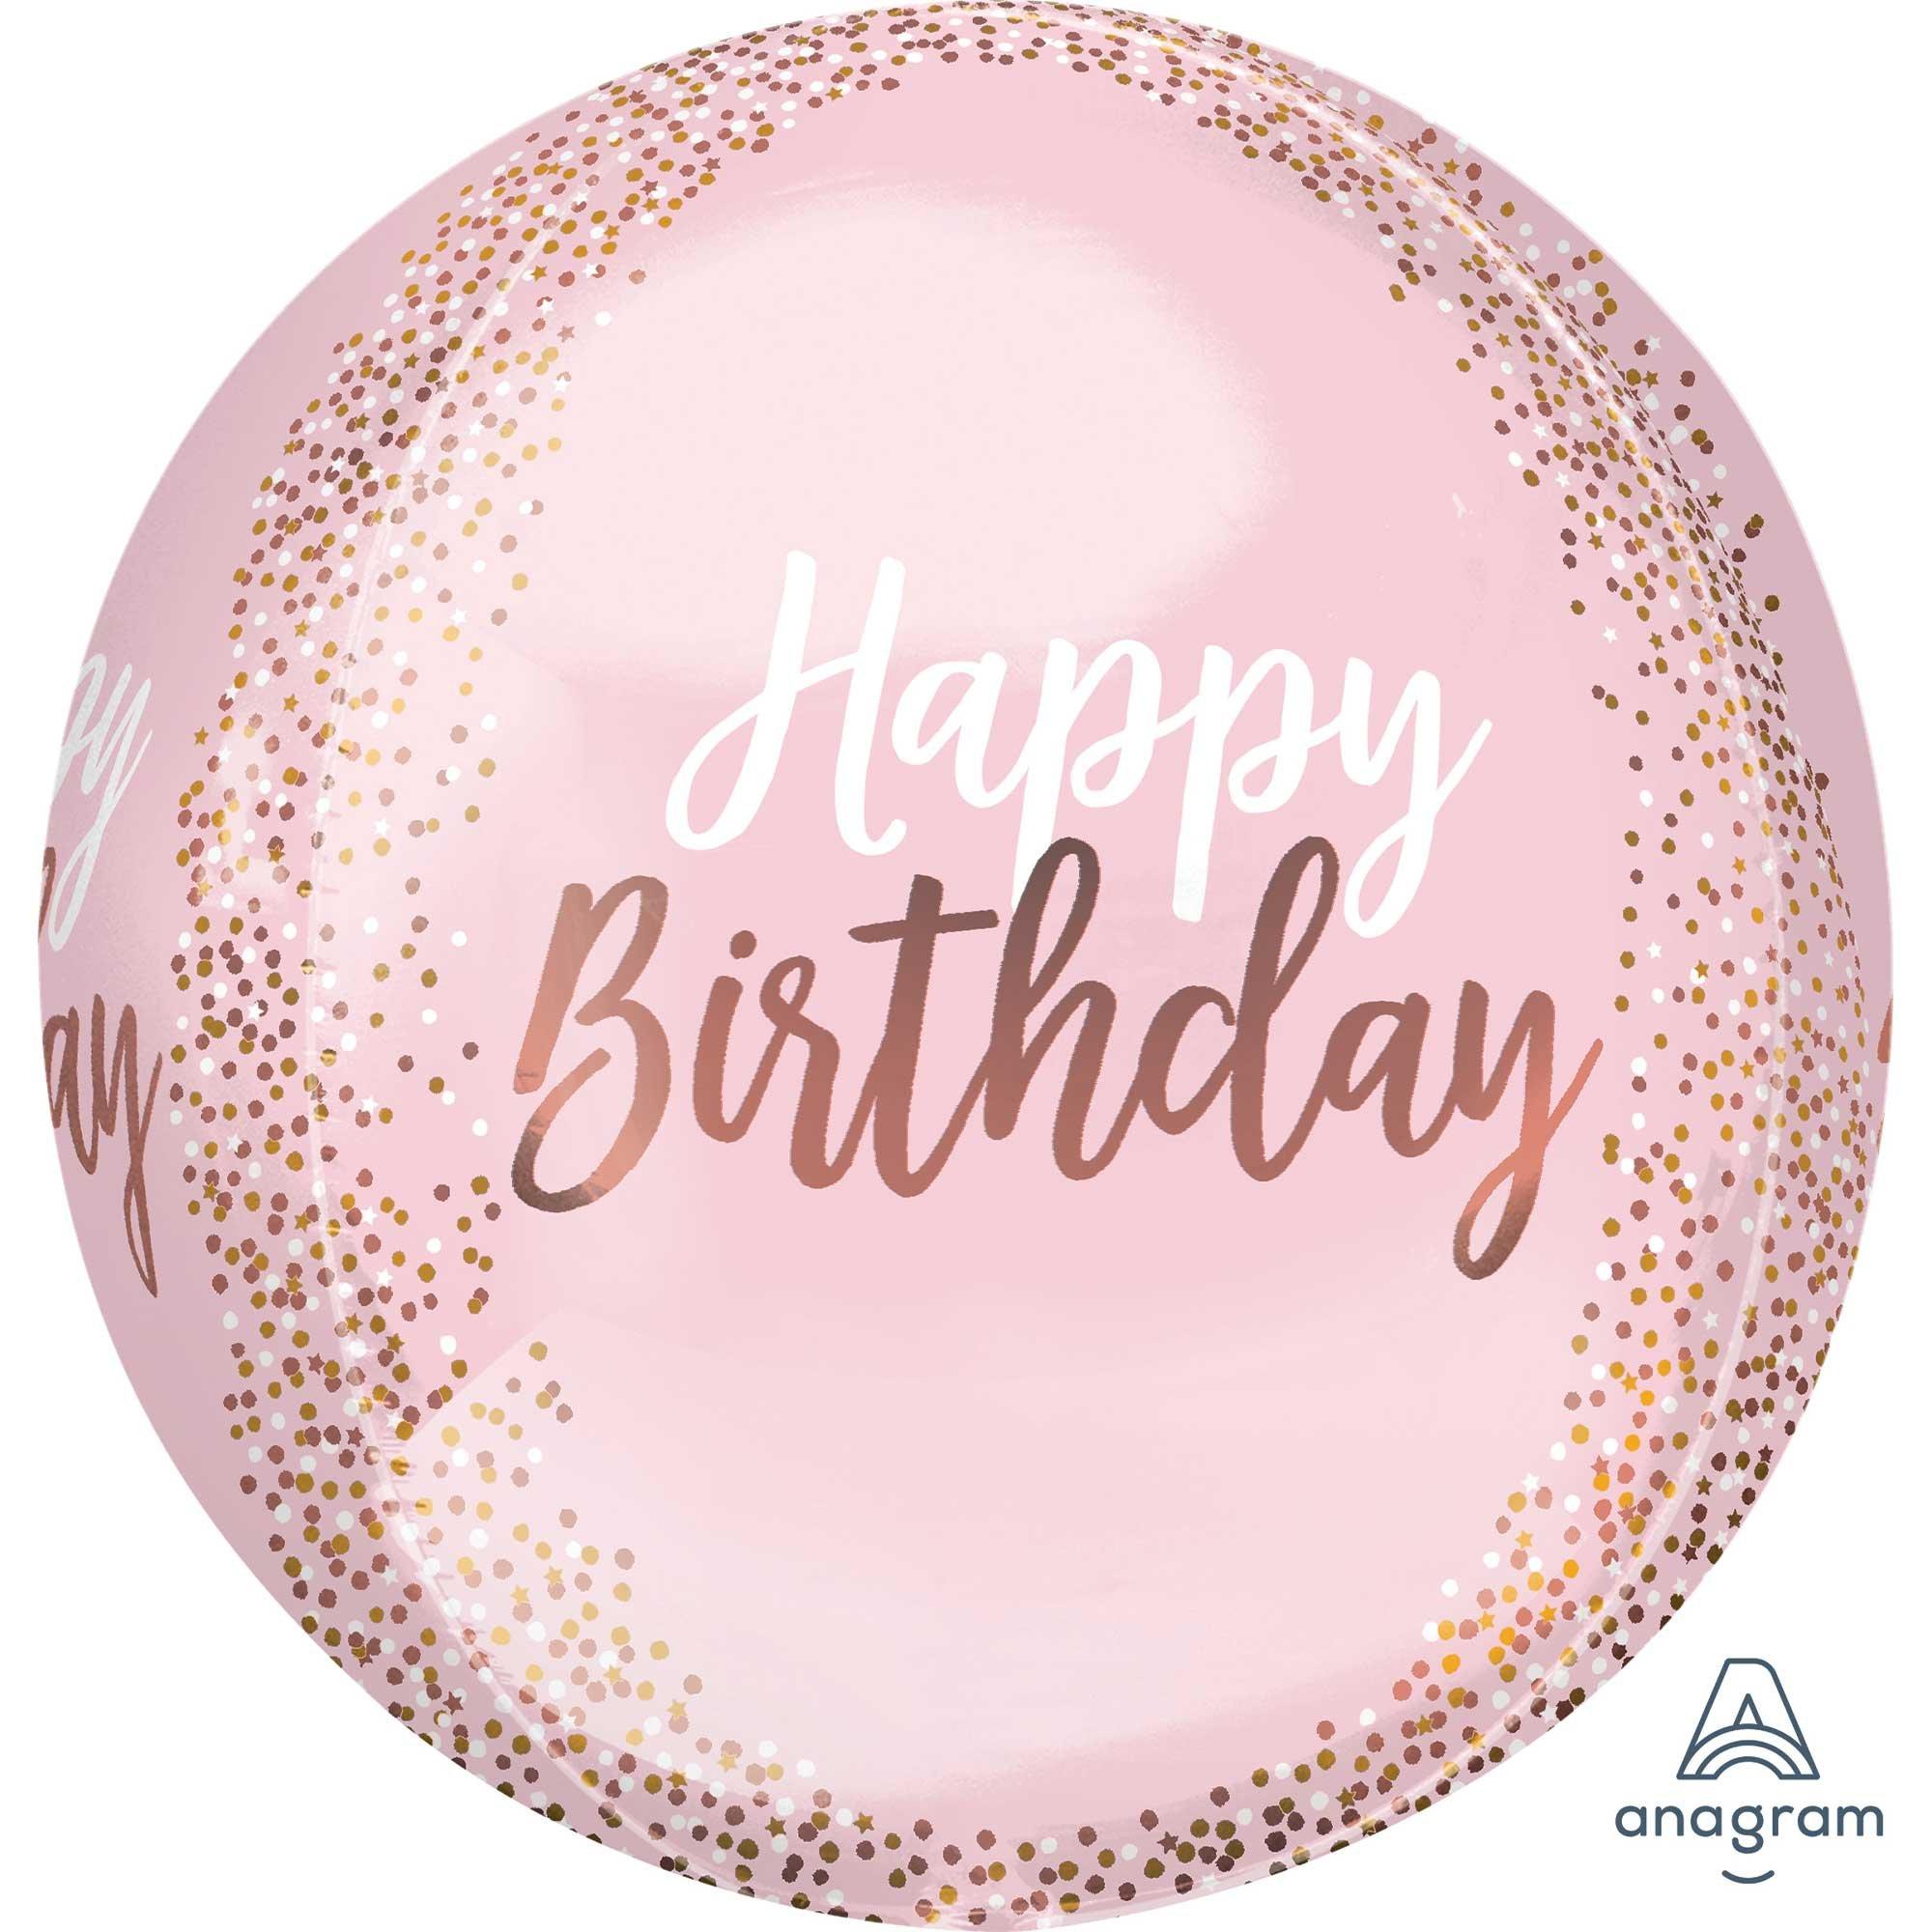 Orbz XL Blush Happy Birthday G20